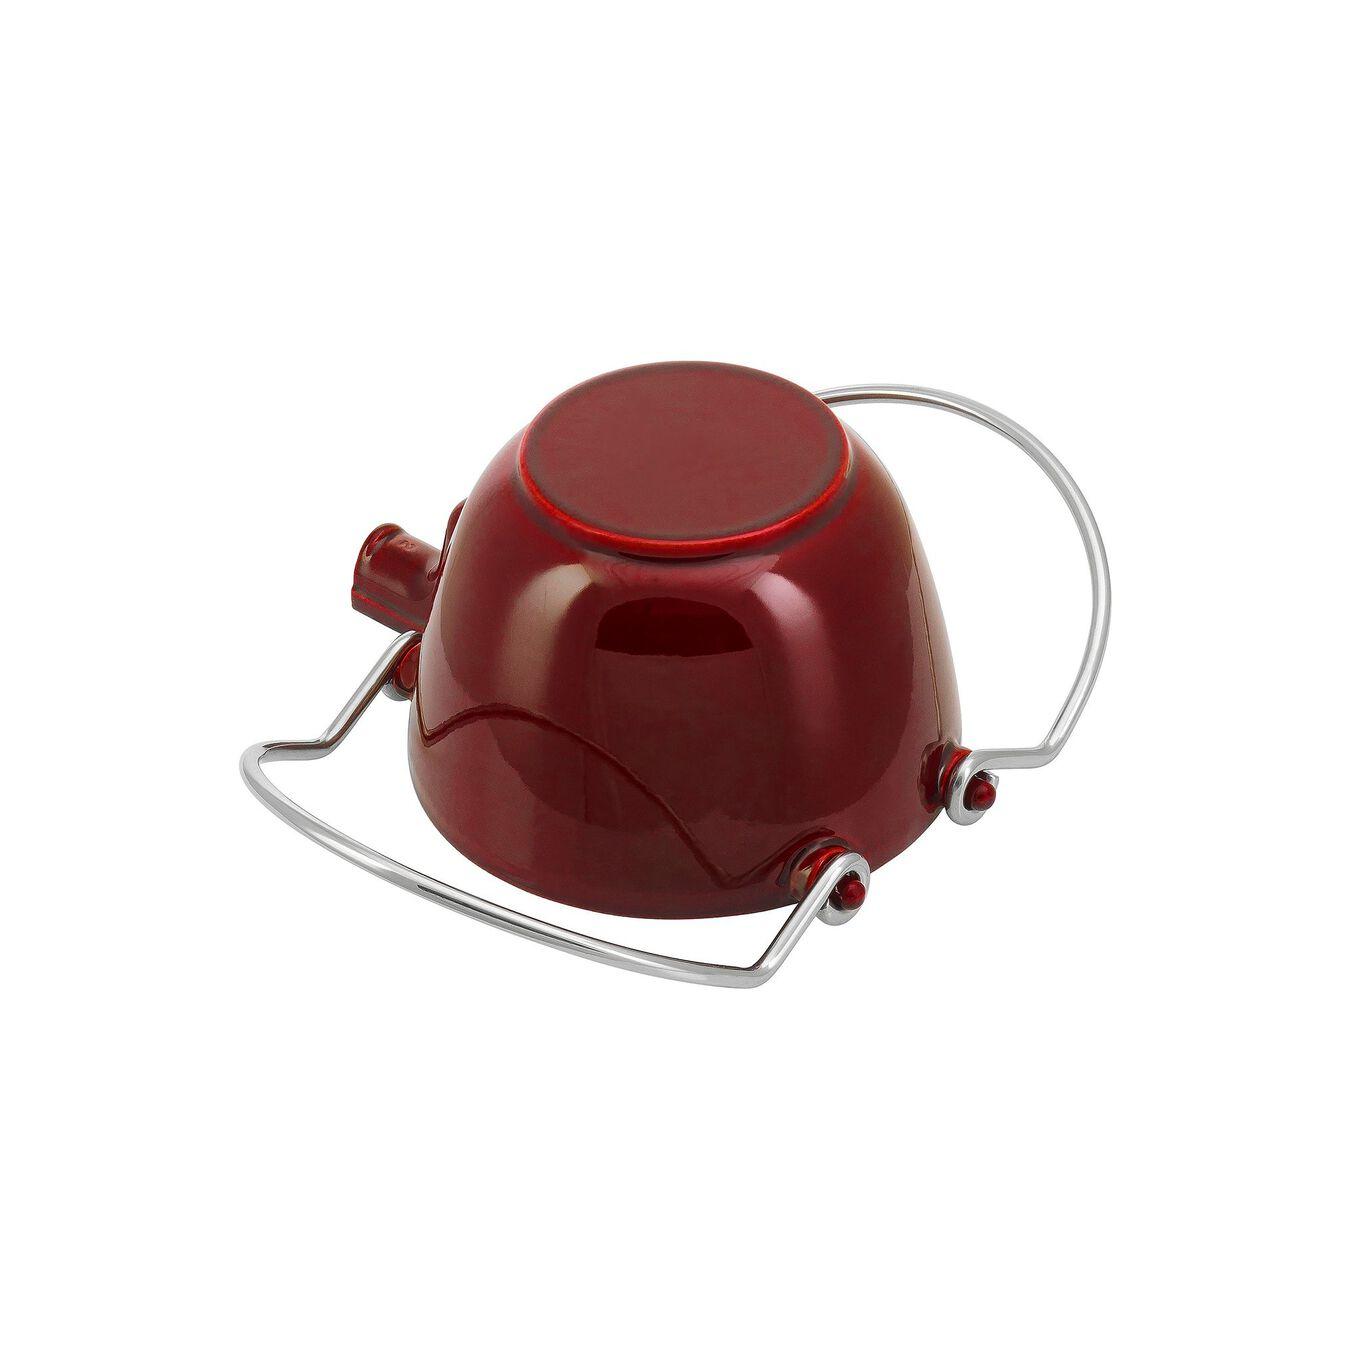 1.25 l Cast iron Tea pot, Grenadine-Red,,large 6